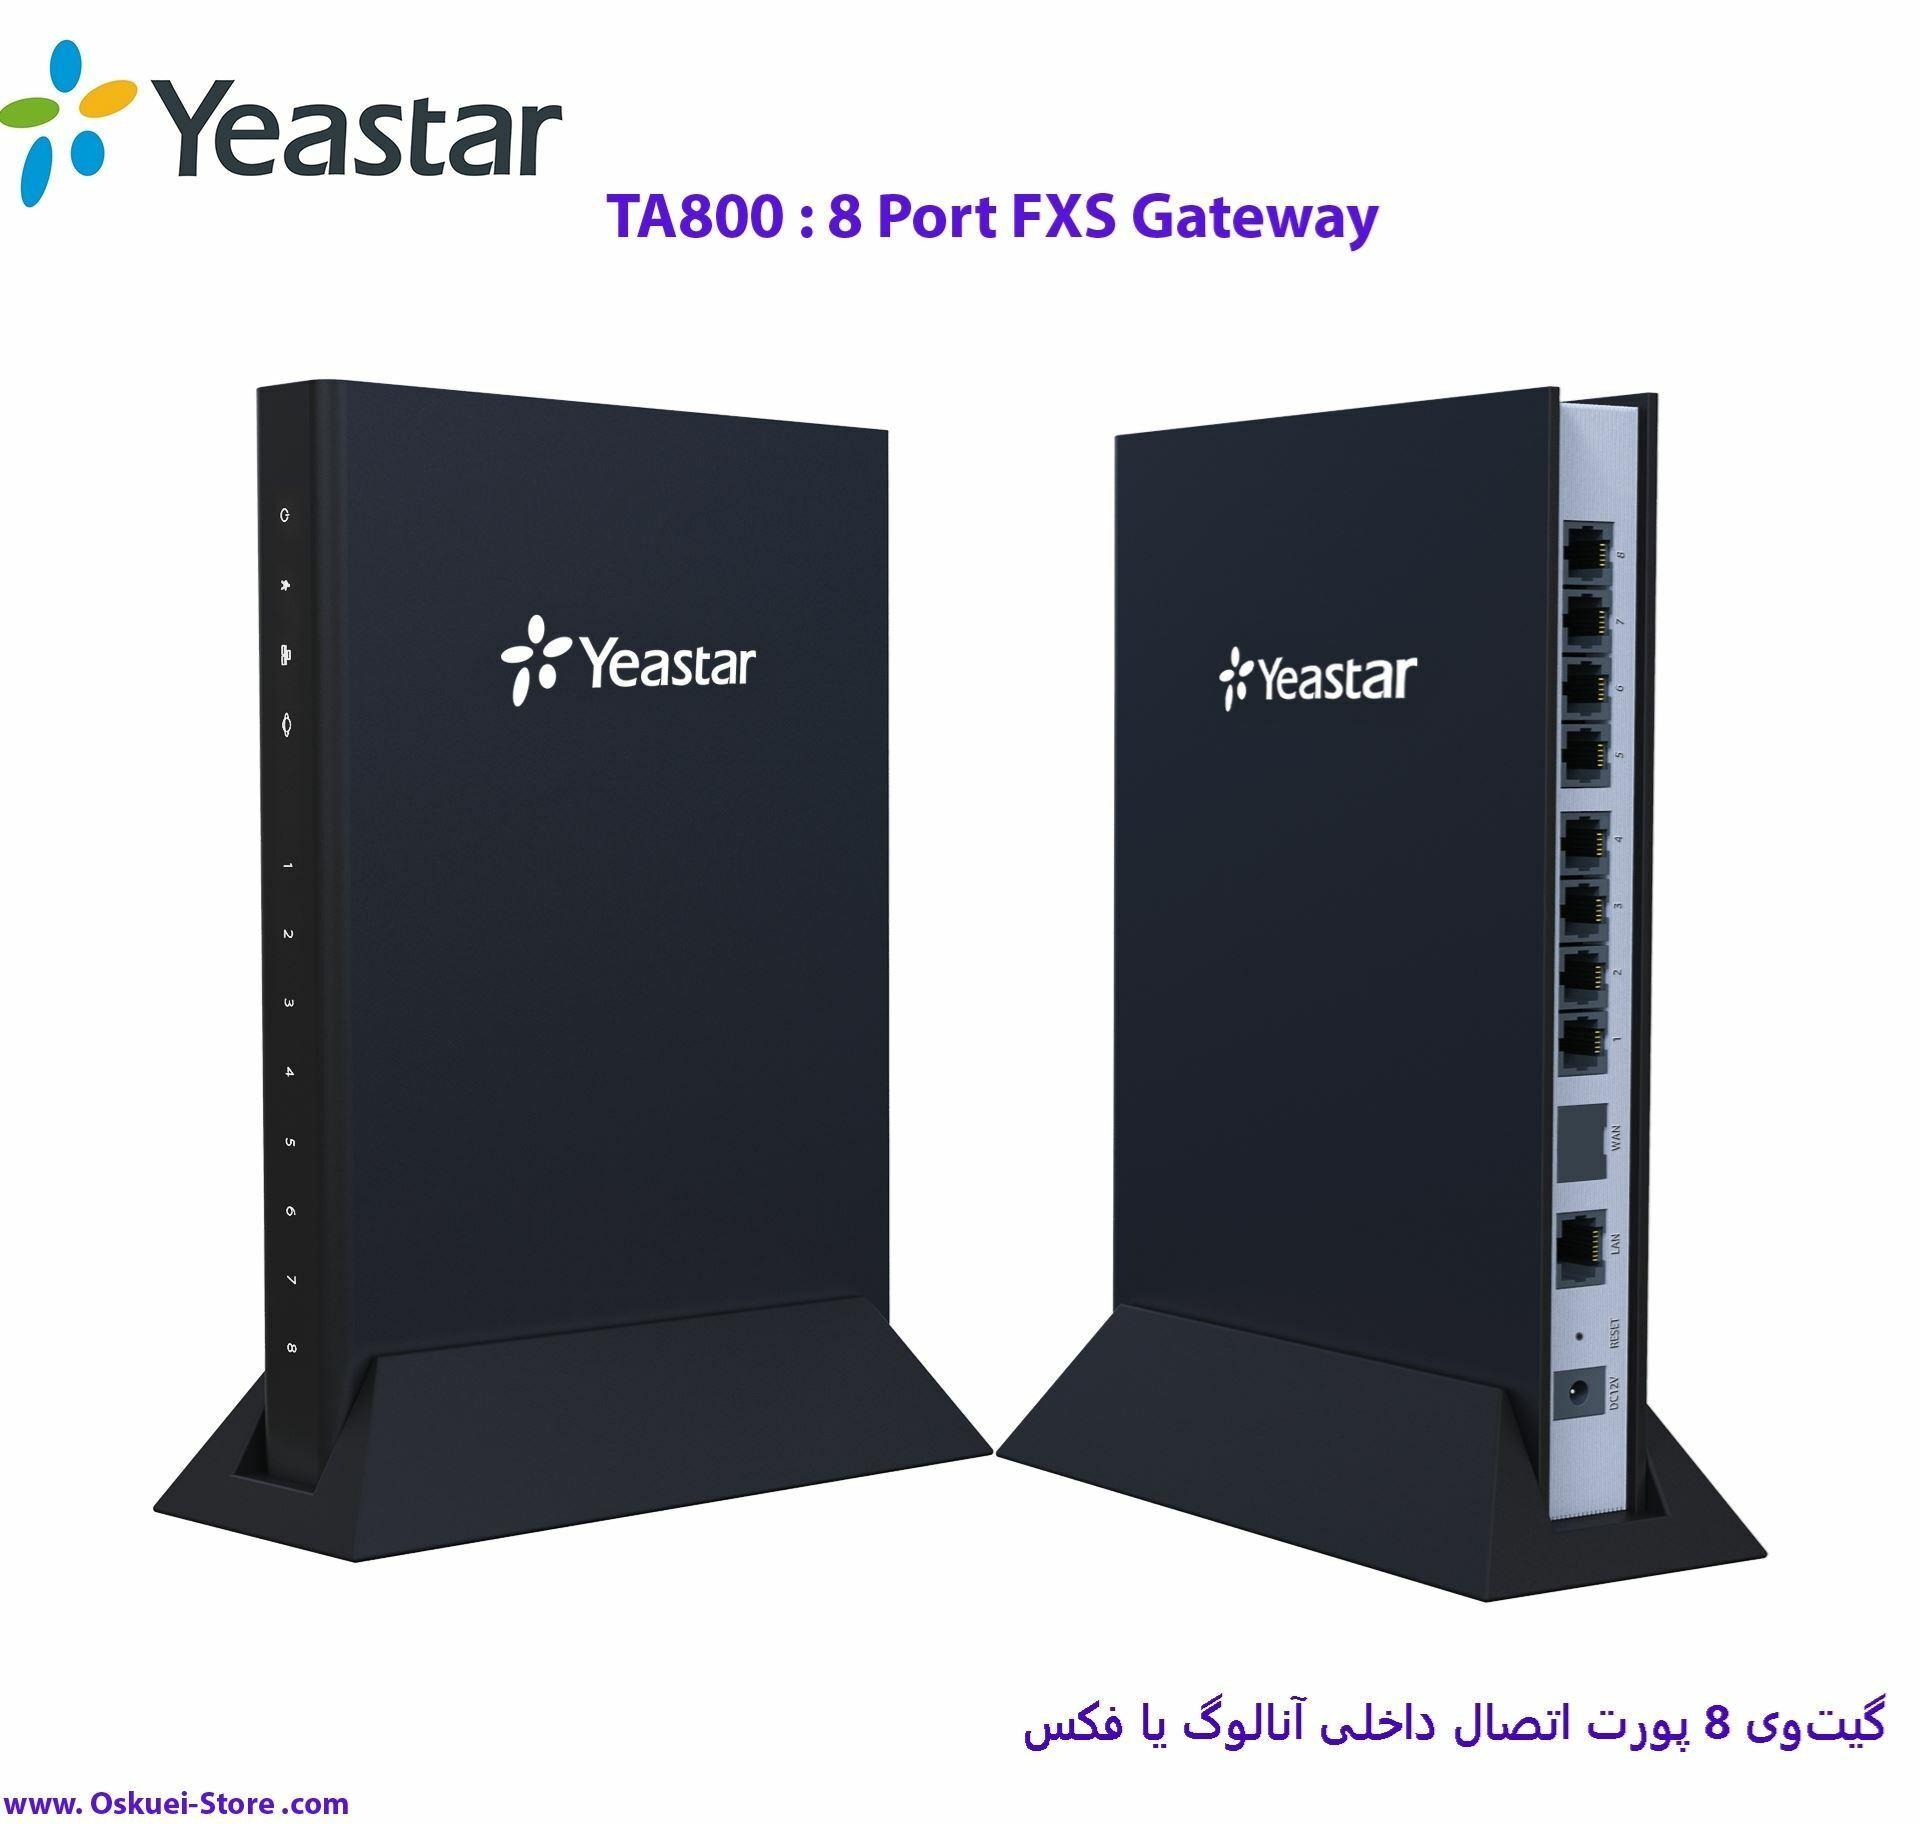 Yeastar TA800 FXS gateway